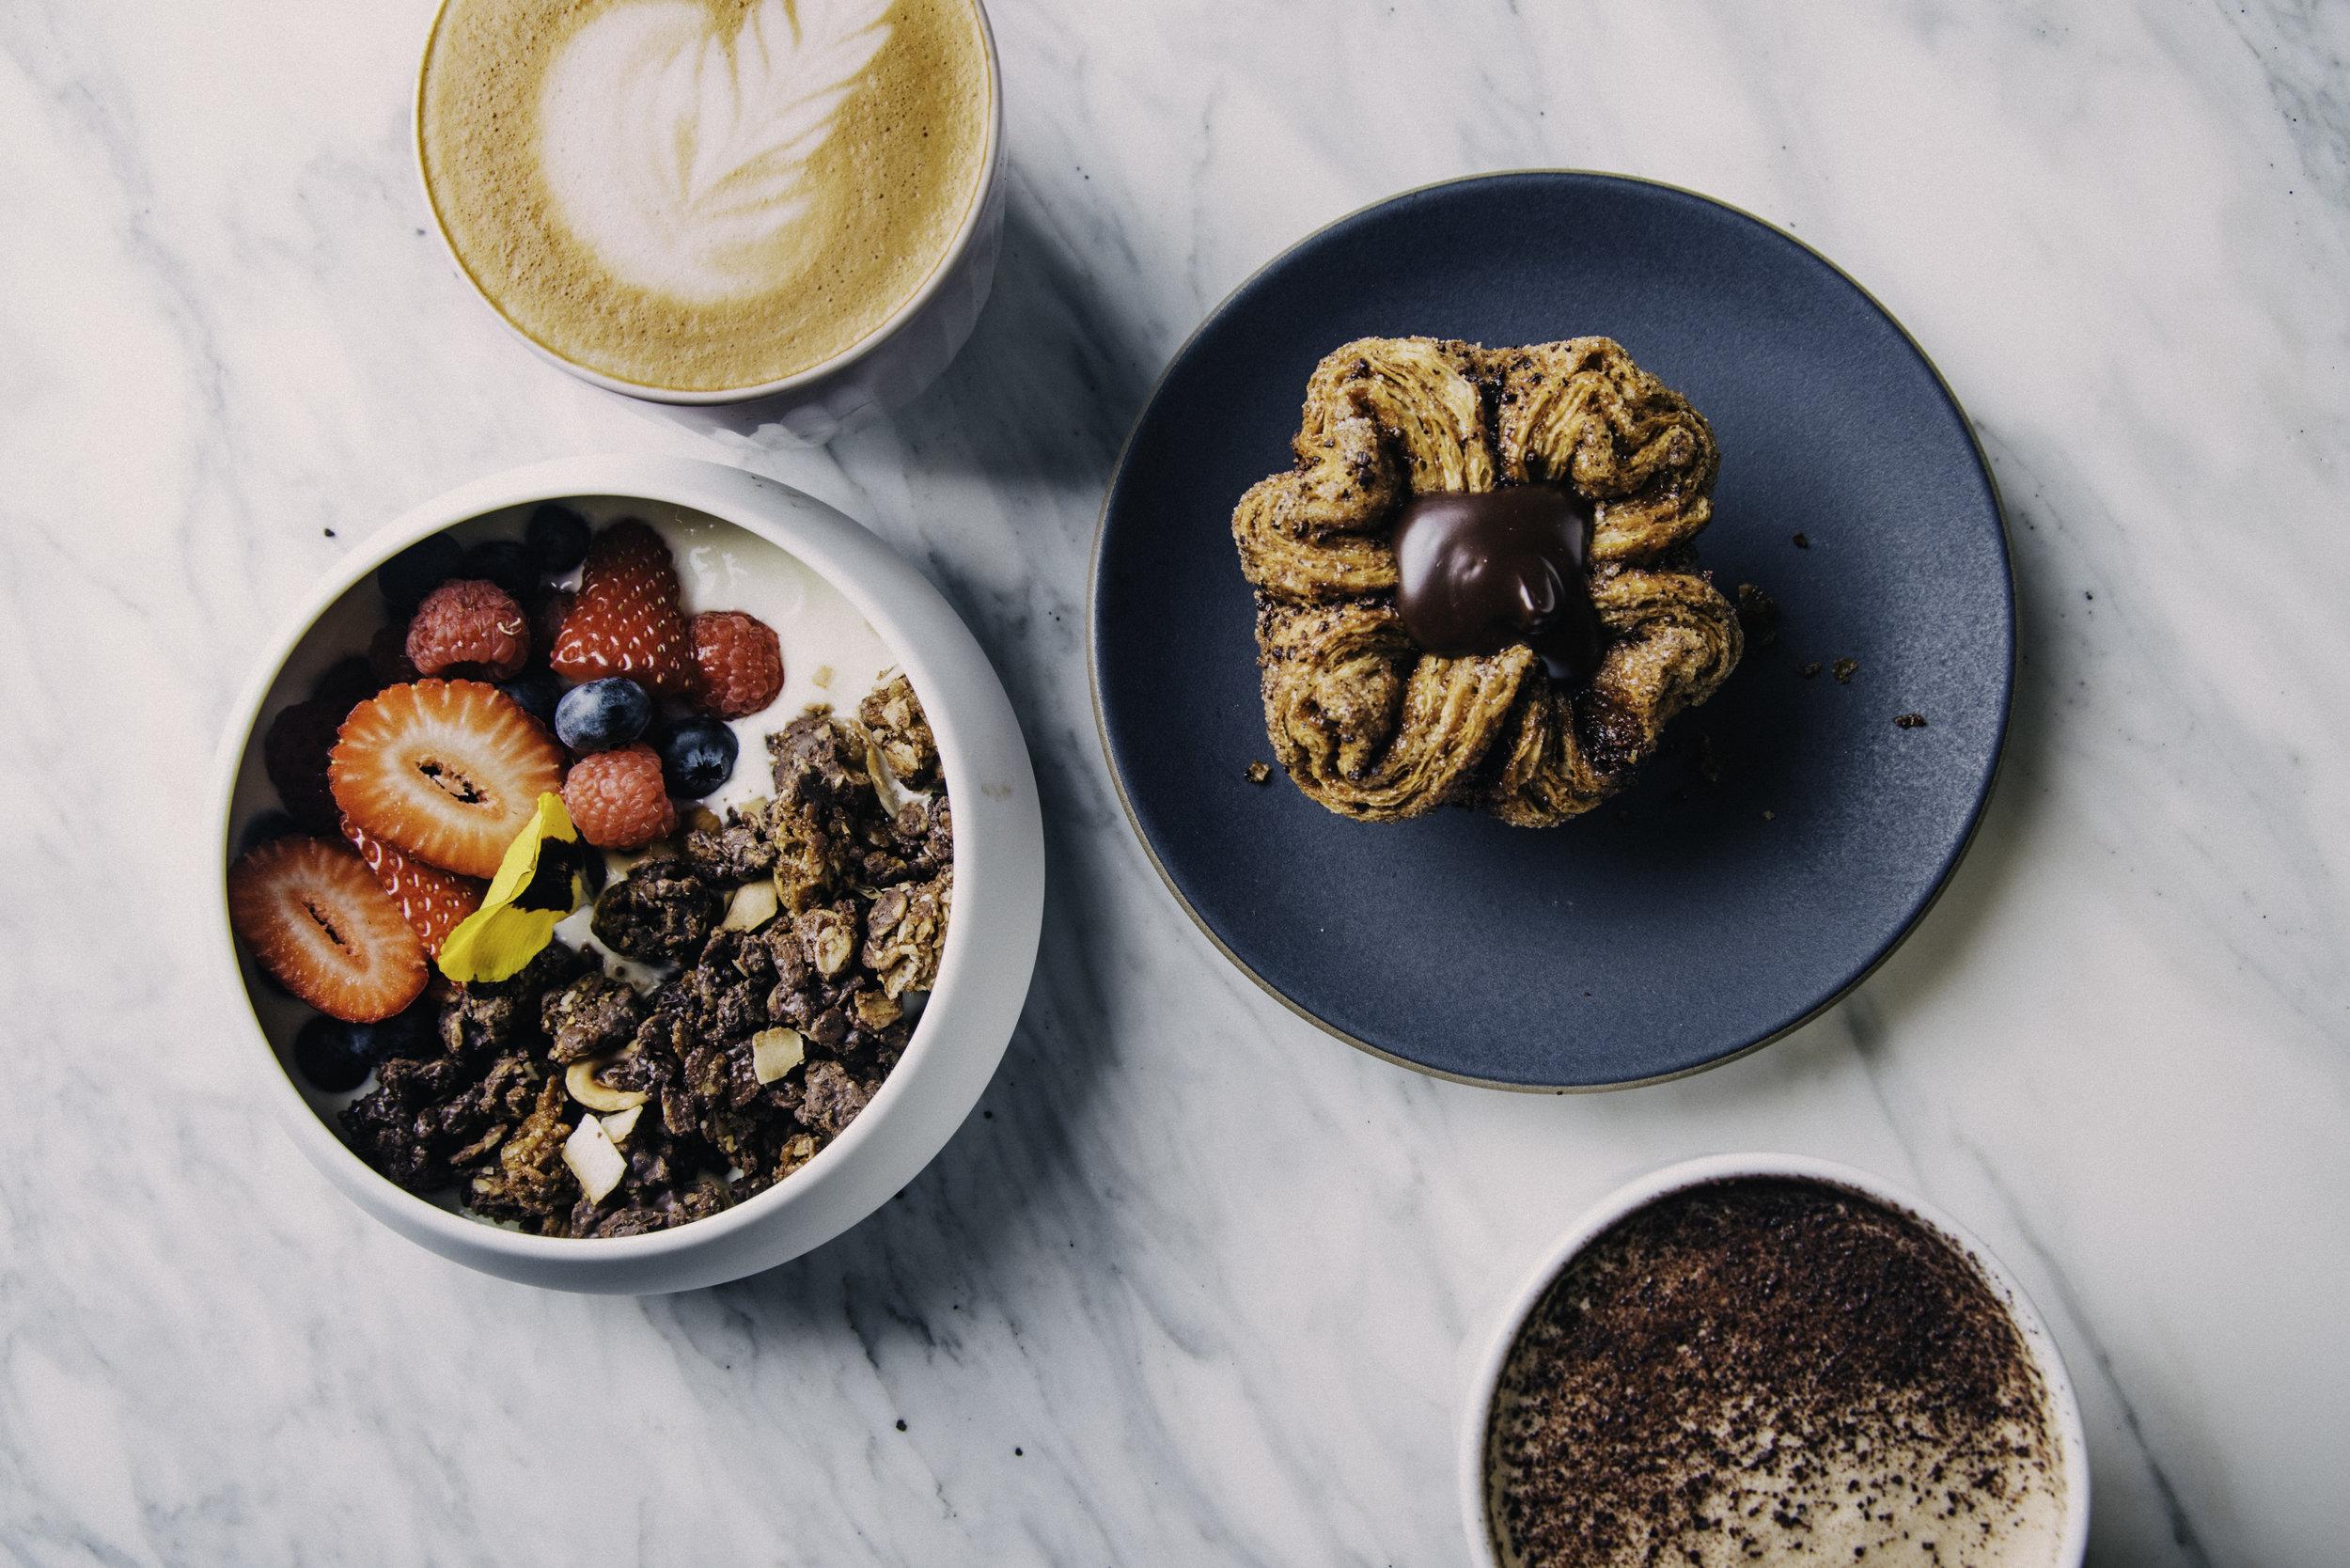 Bloom's breakfast offerings. Photo:  Eric Wolfinger